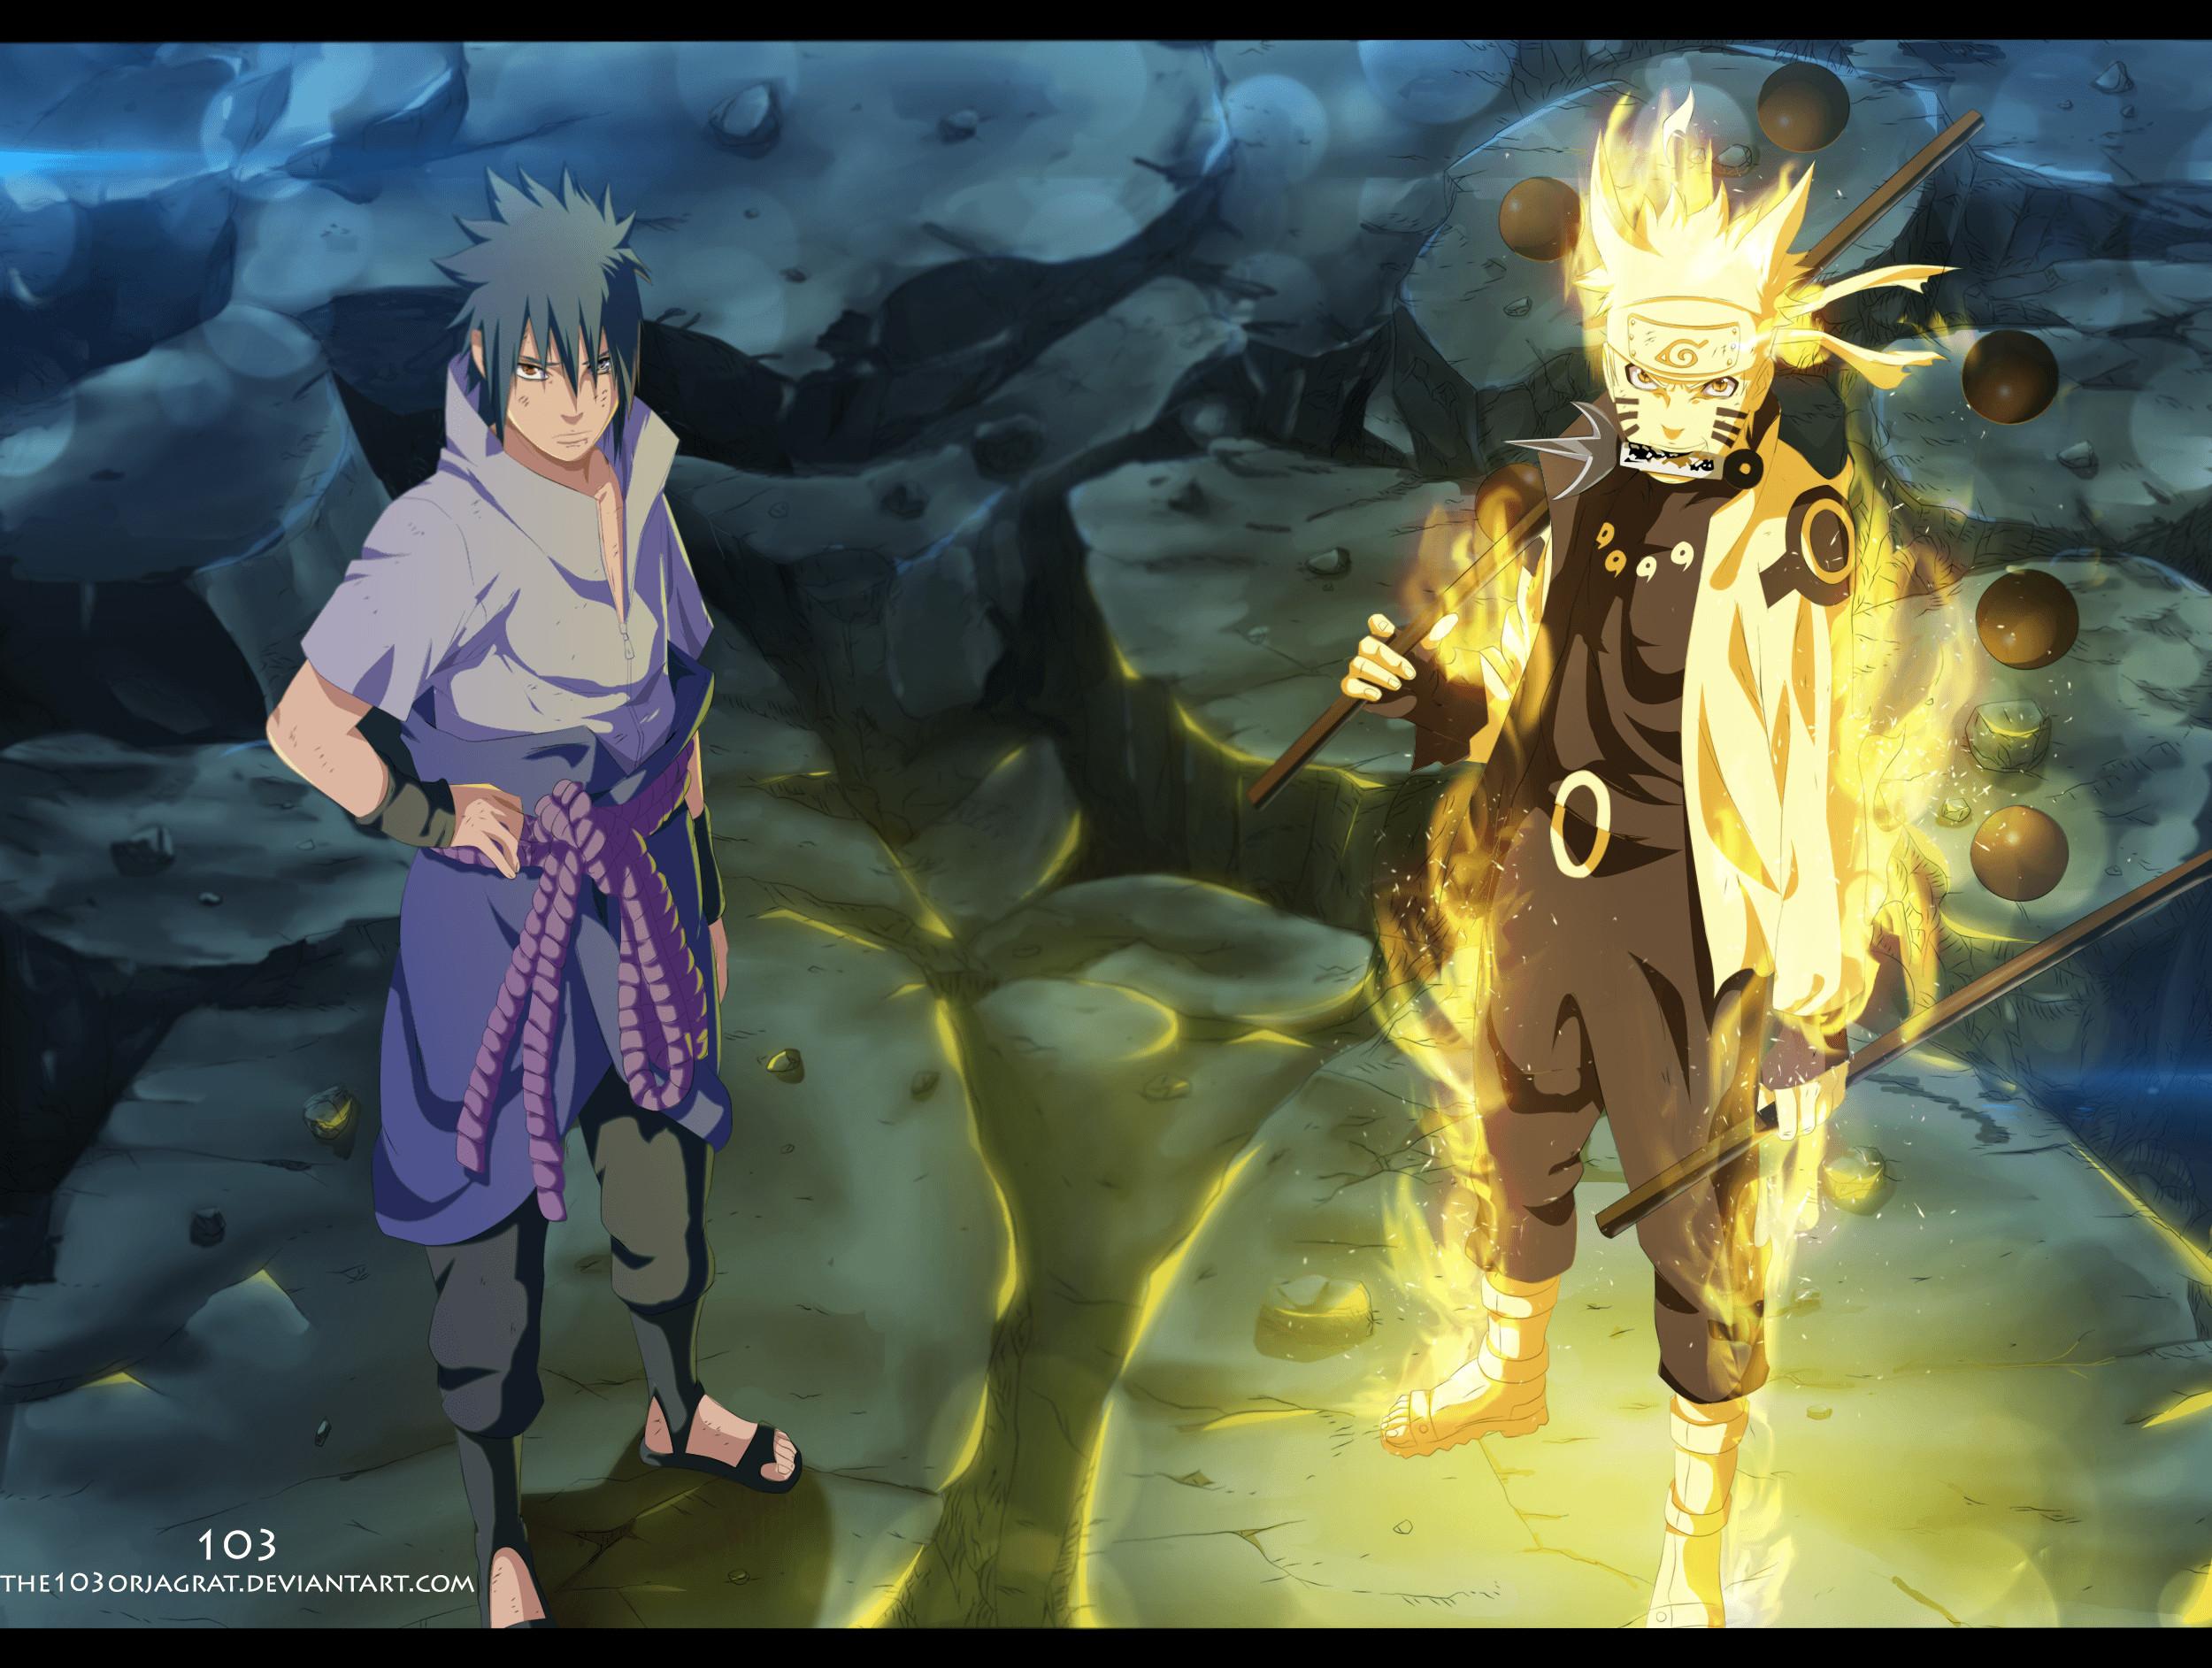 Naruto and sasuke vs madara wallpapers 54 images - Naruto and sasuki ...